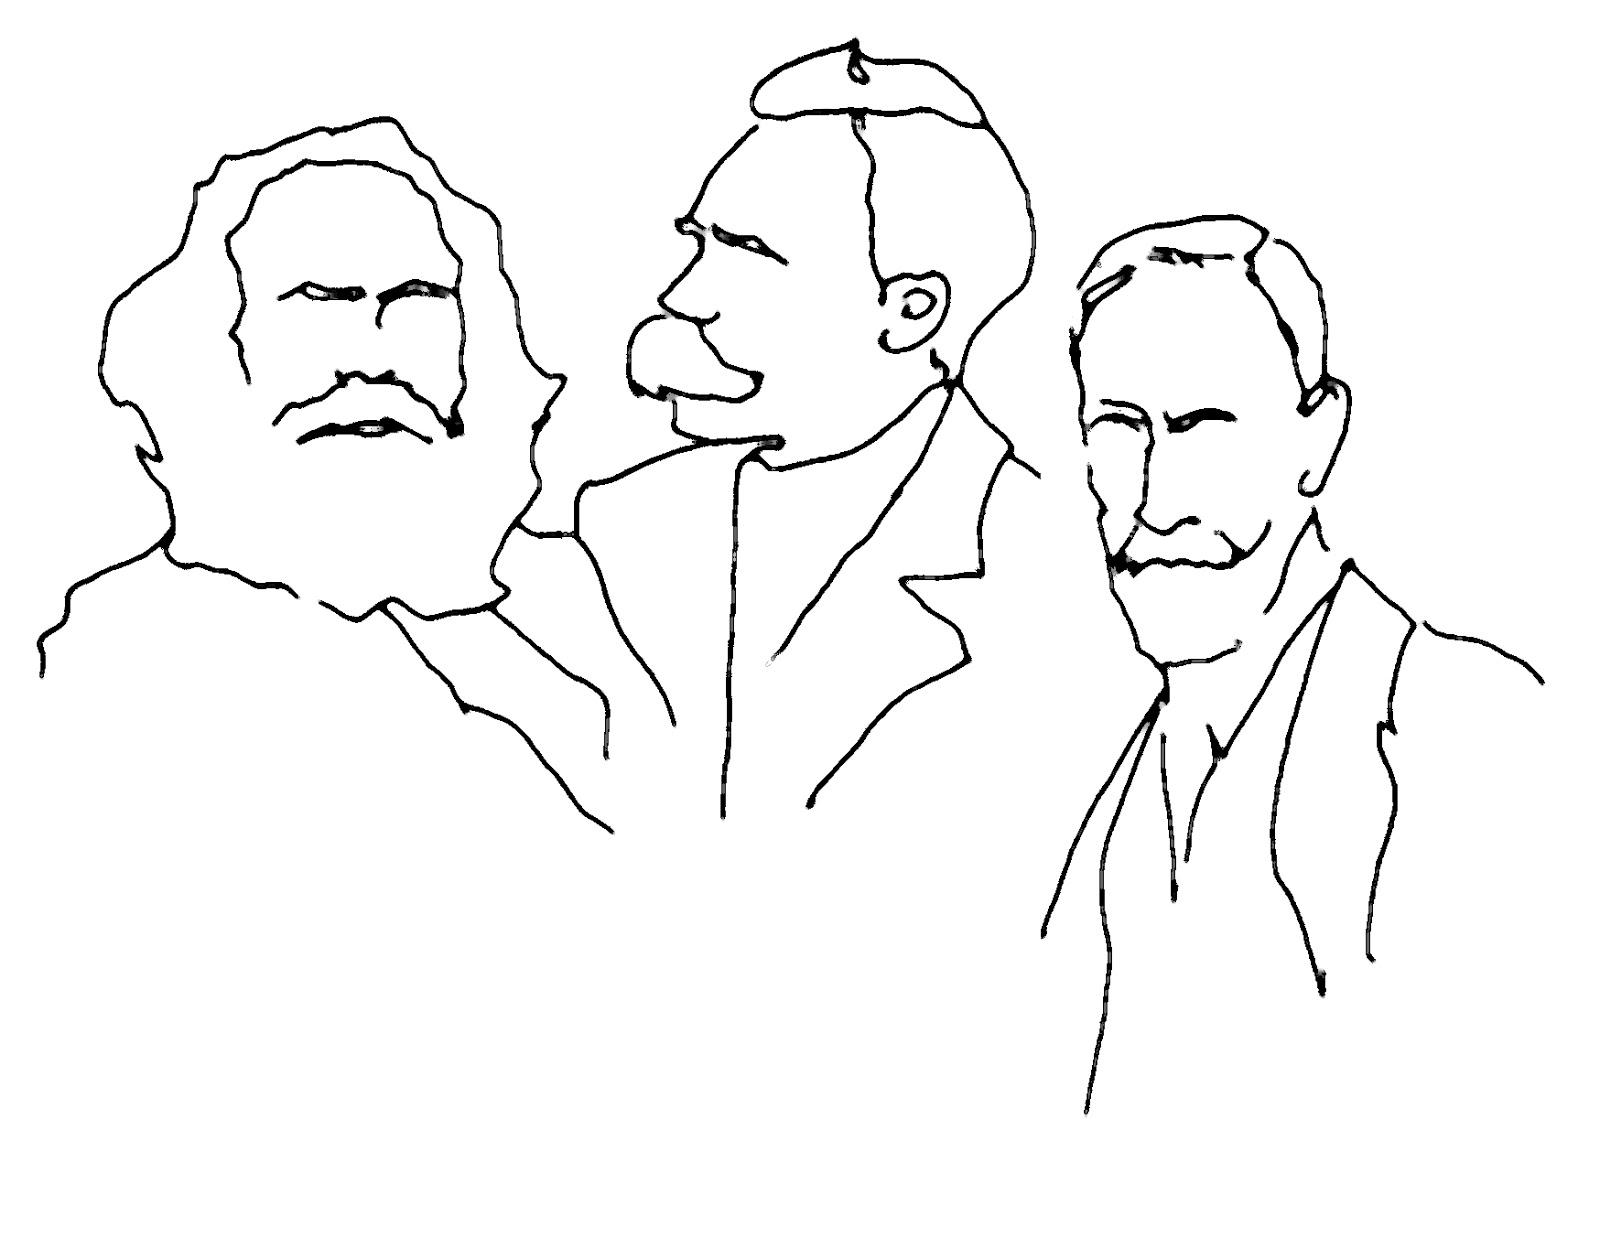 Notas (im)pertinentes de Ignasi Moreta: Marx, Nietzsche, Freud... y  Francesc Torralba